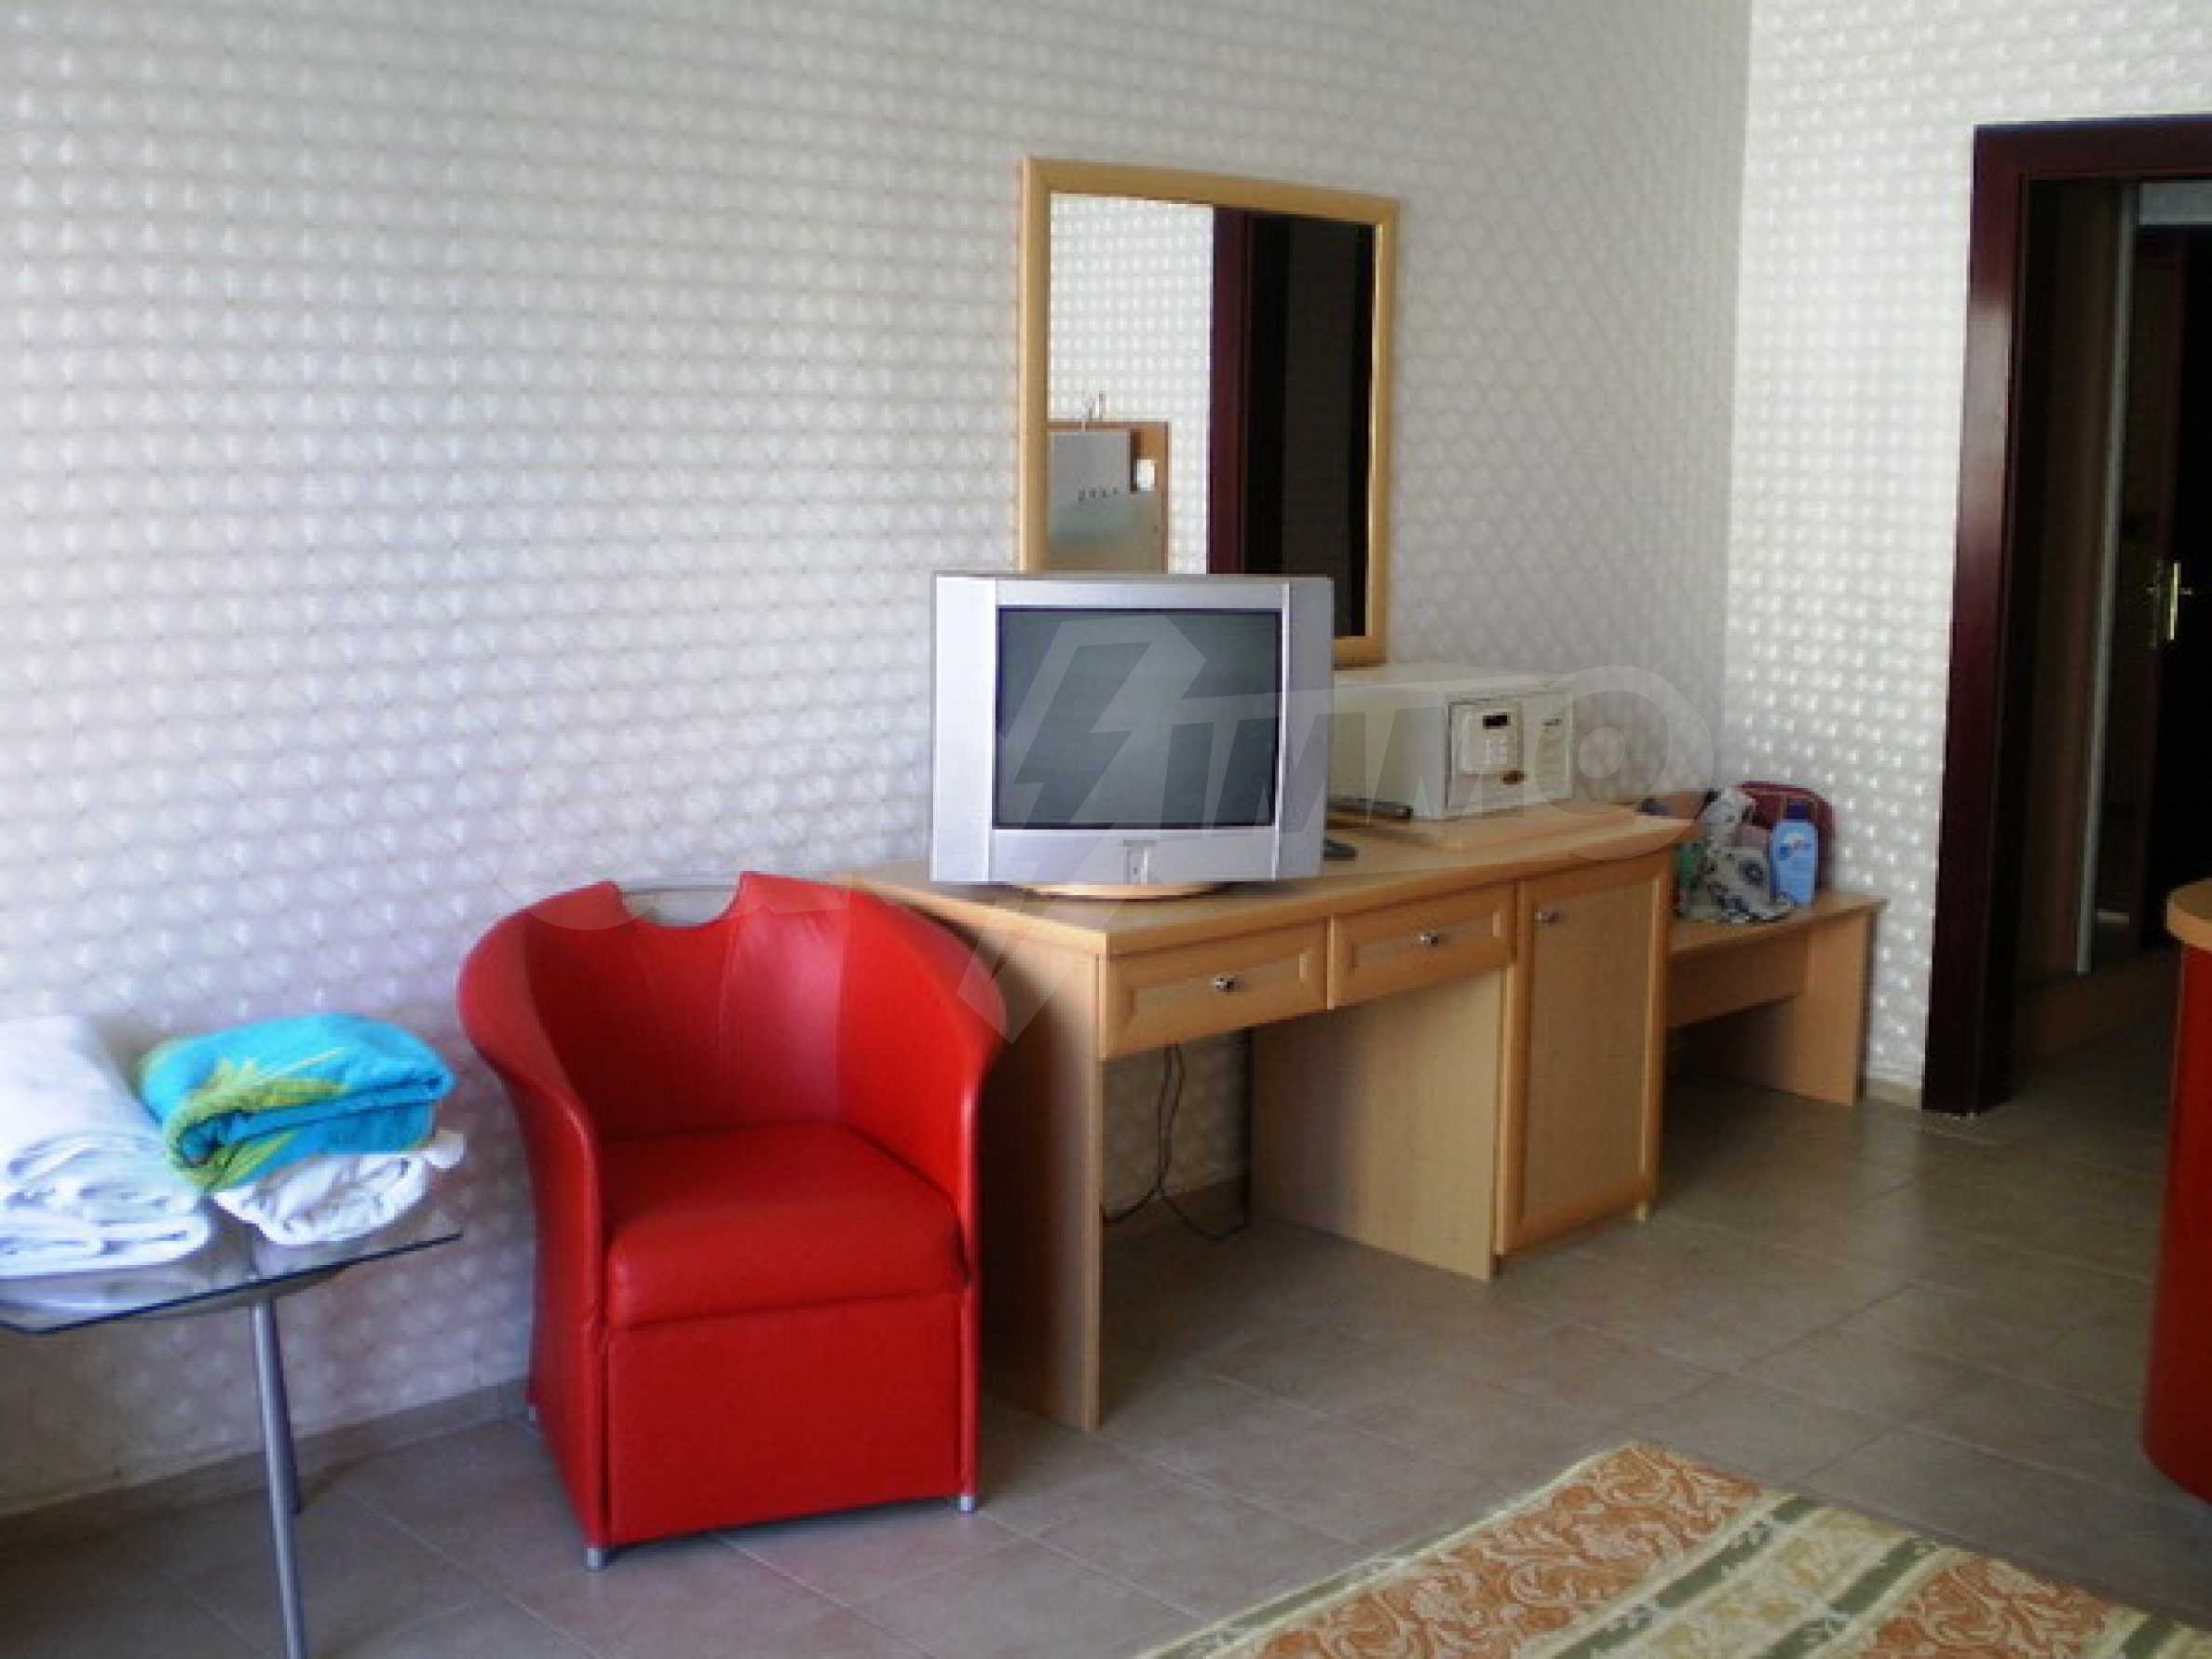 Студия в отеле «Планета» 15